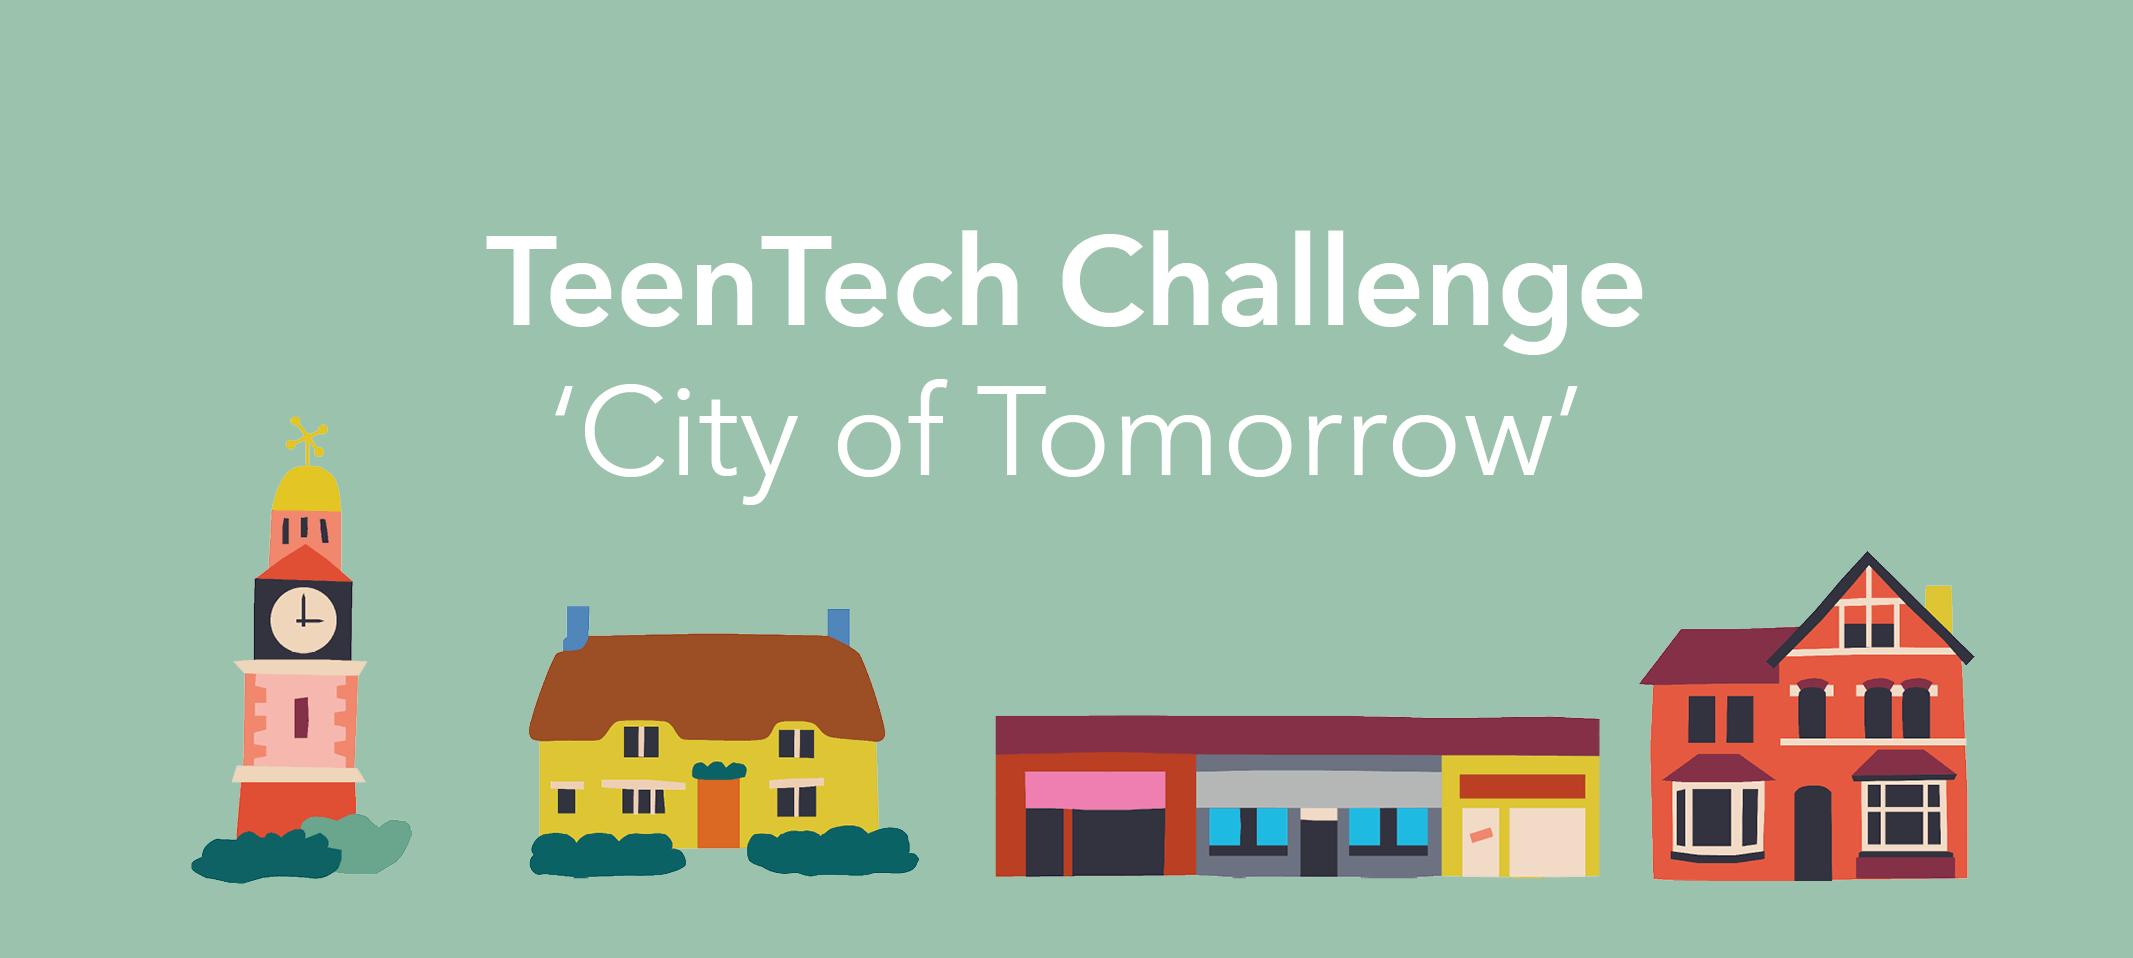 TeenTech Challenge 'City of Tomorrow'